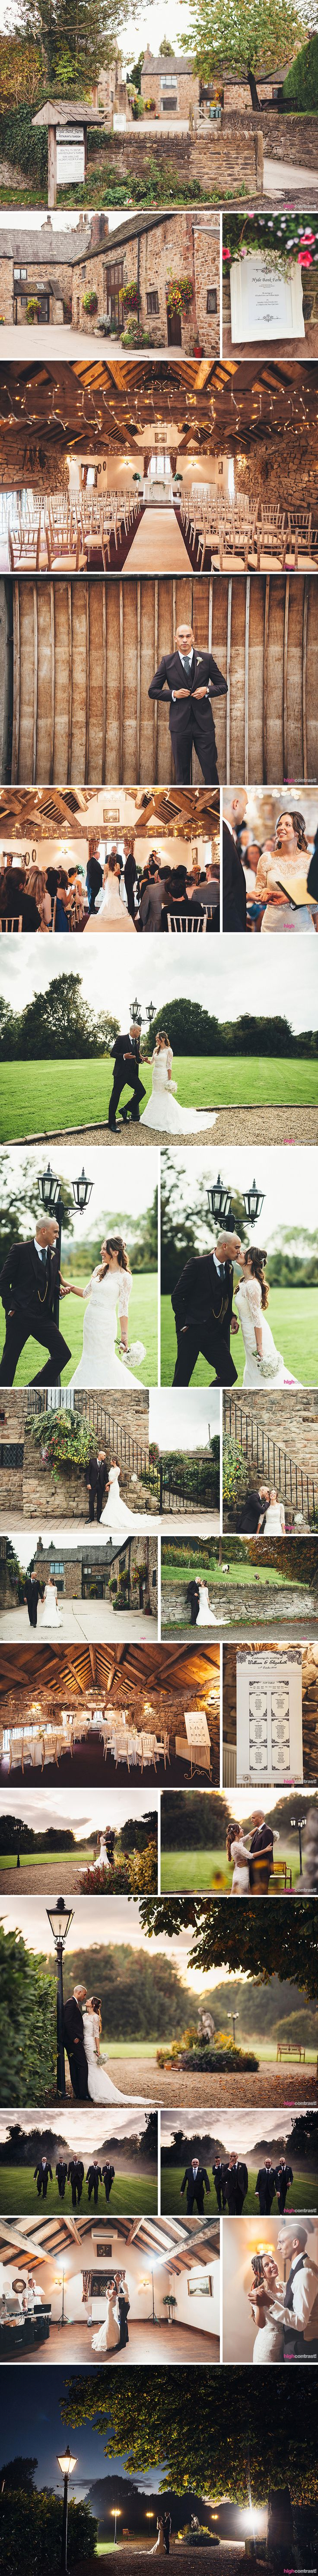 Hyde Bank farm, Romiley, Cheshire - Wedding Day Photos #HydeBank #Romiley #Cheshire #Wedding #couple #married #flowers #barn #lamppost #fog #firstdance #WDP #venue #WeddingVenue #inspiration #Ideas #bridal #portrait #bride #groom #rings #TableSetting #bridge #gardens #ceremony #trees #rural #wooden #beams